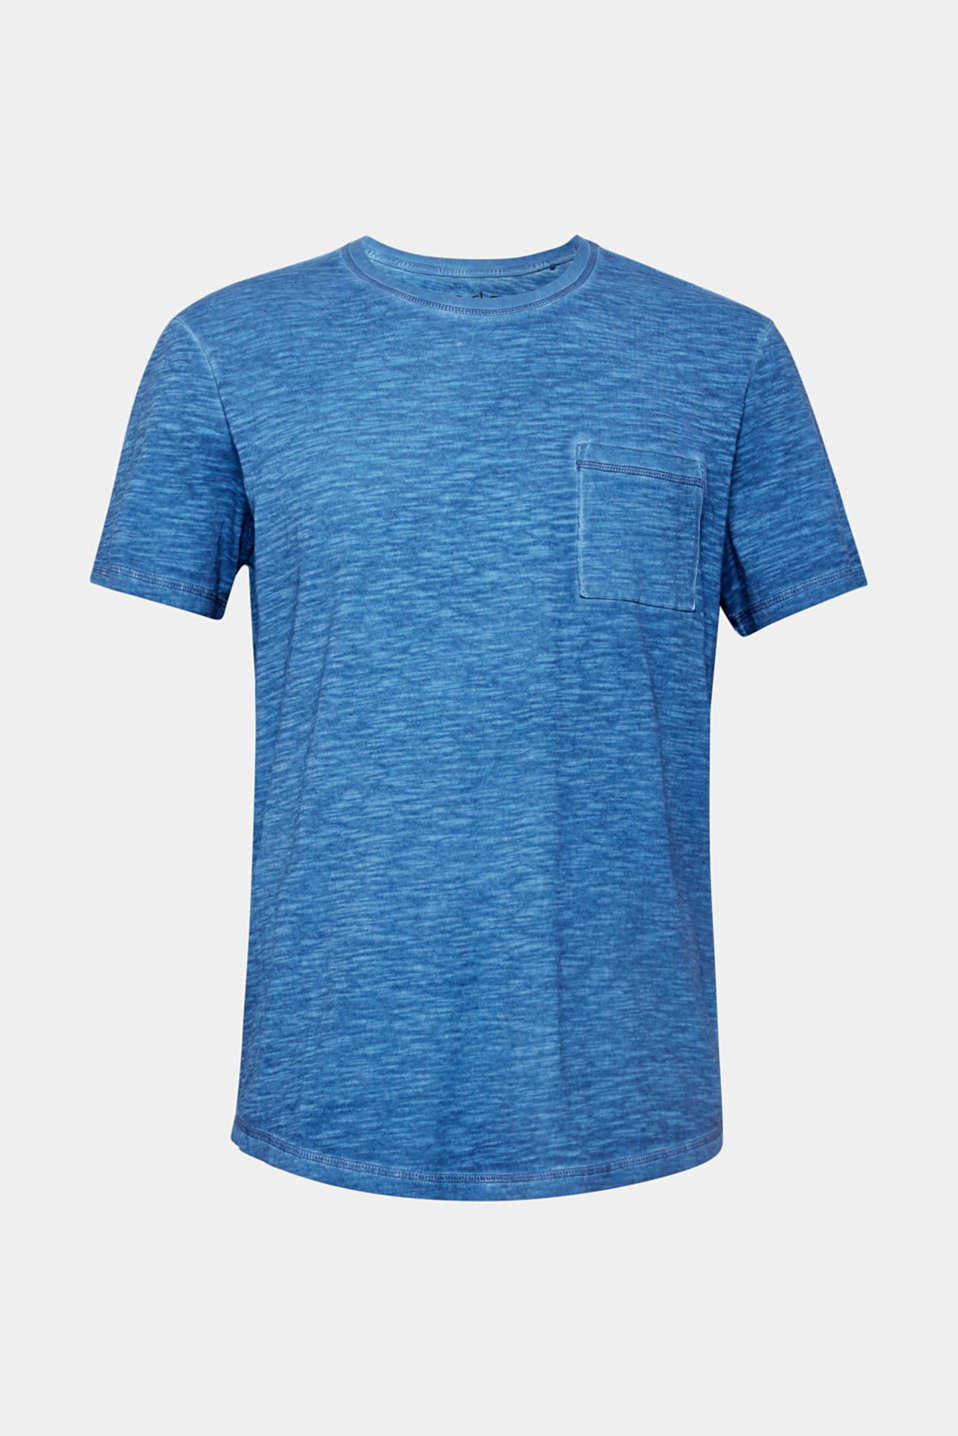 T-Shirts, BLUE, detail image number 5